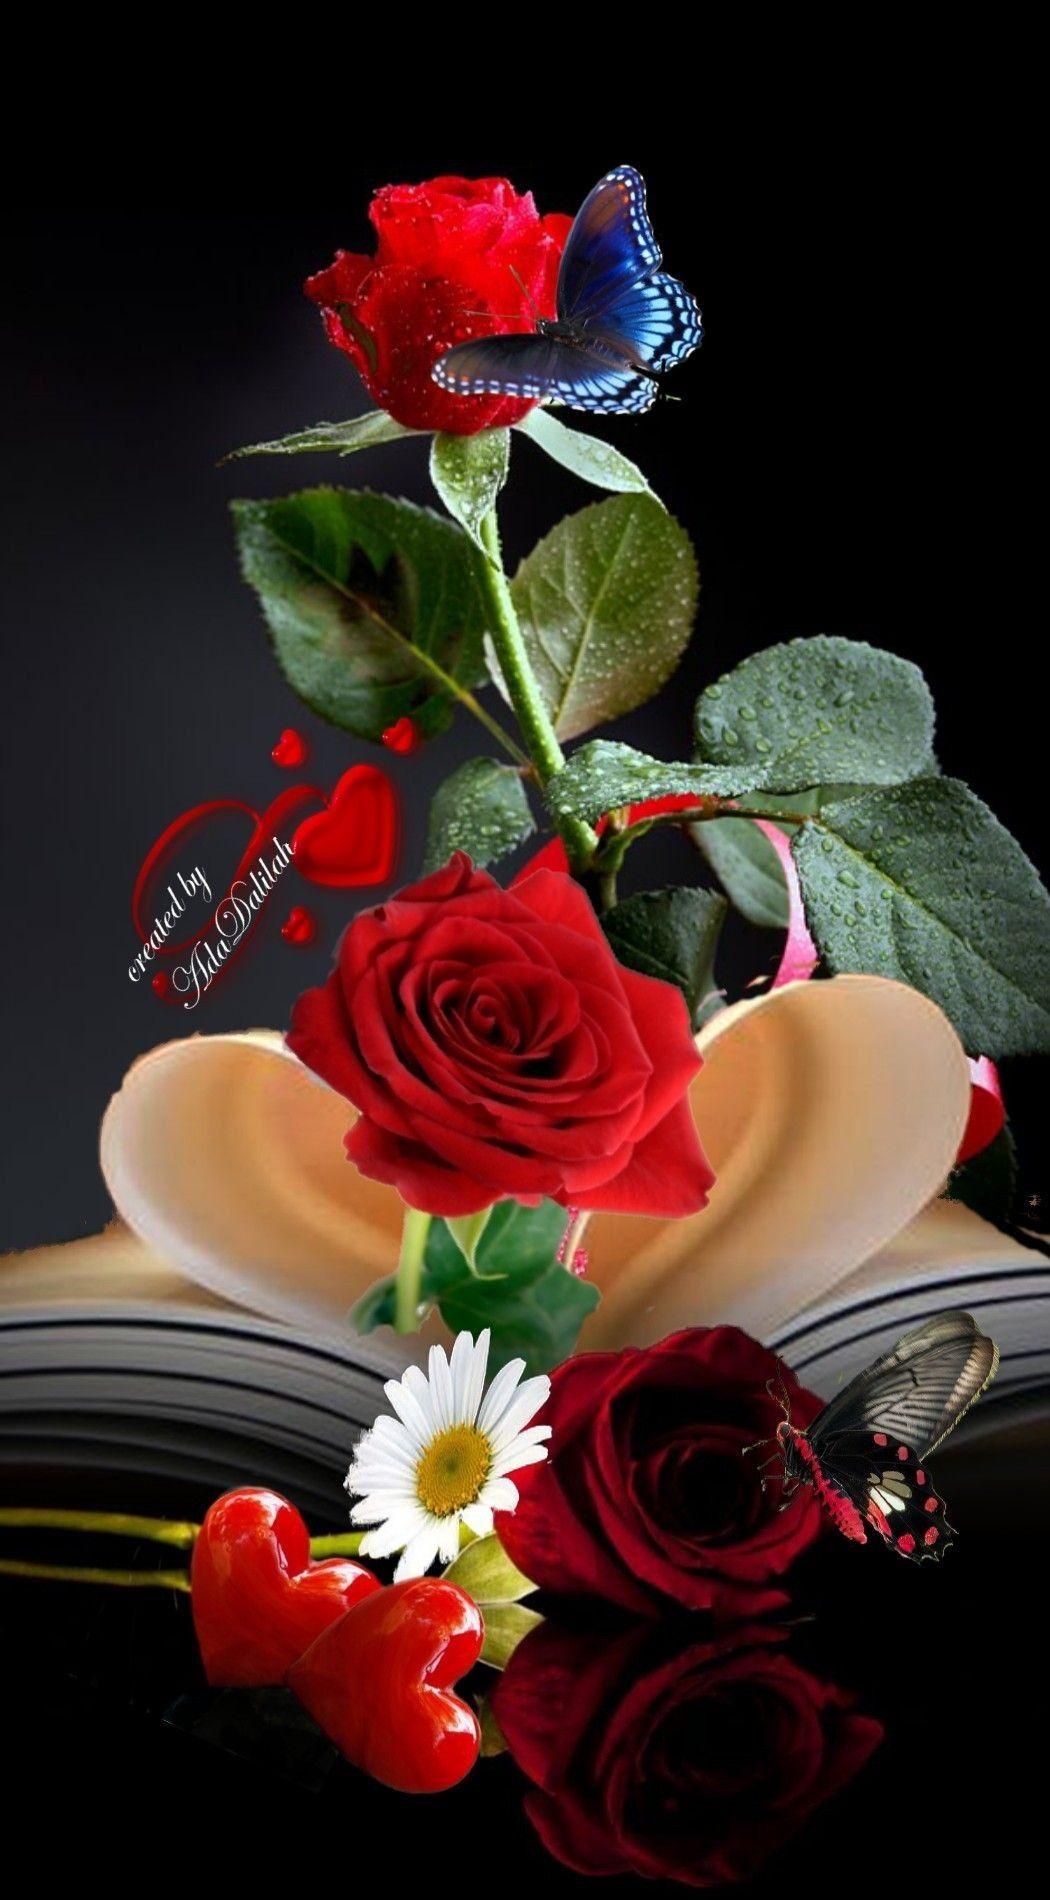 Pin By Pearl Aranda On Beautiful Roses Beautiful Flowers Wallpapers Flower Phone Wallpaper Beautiful Rose Flowers